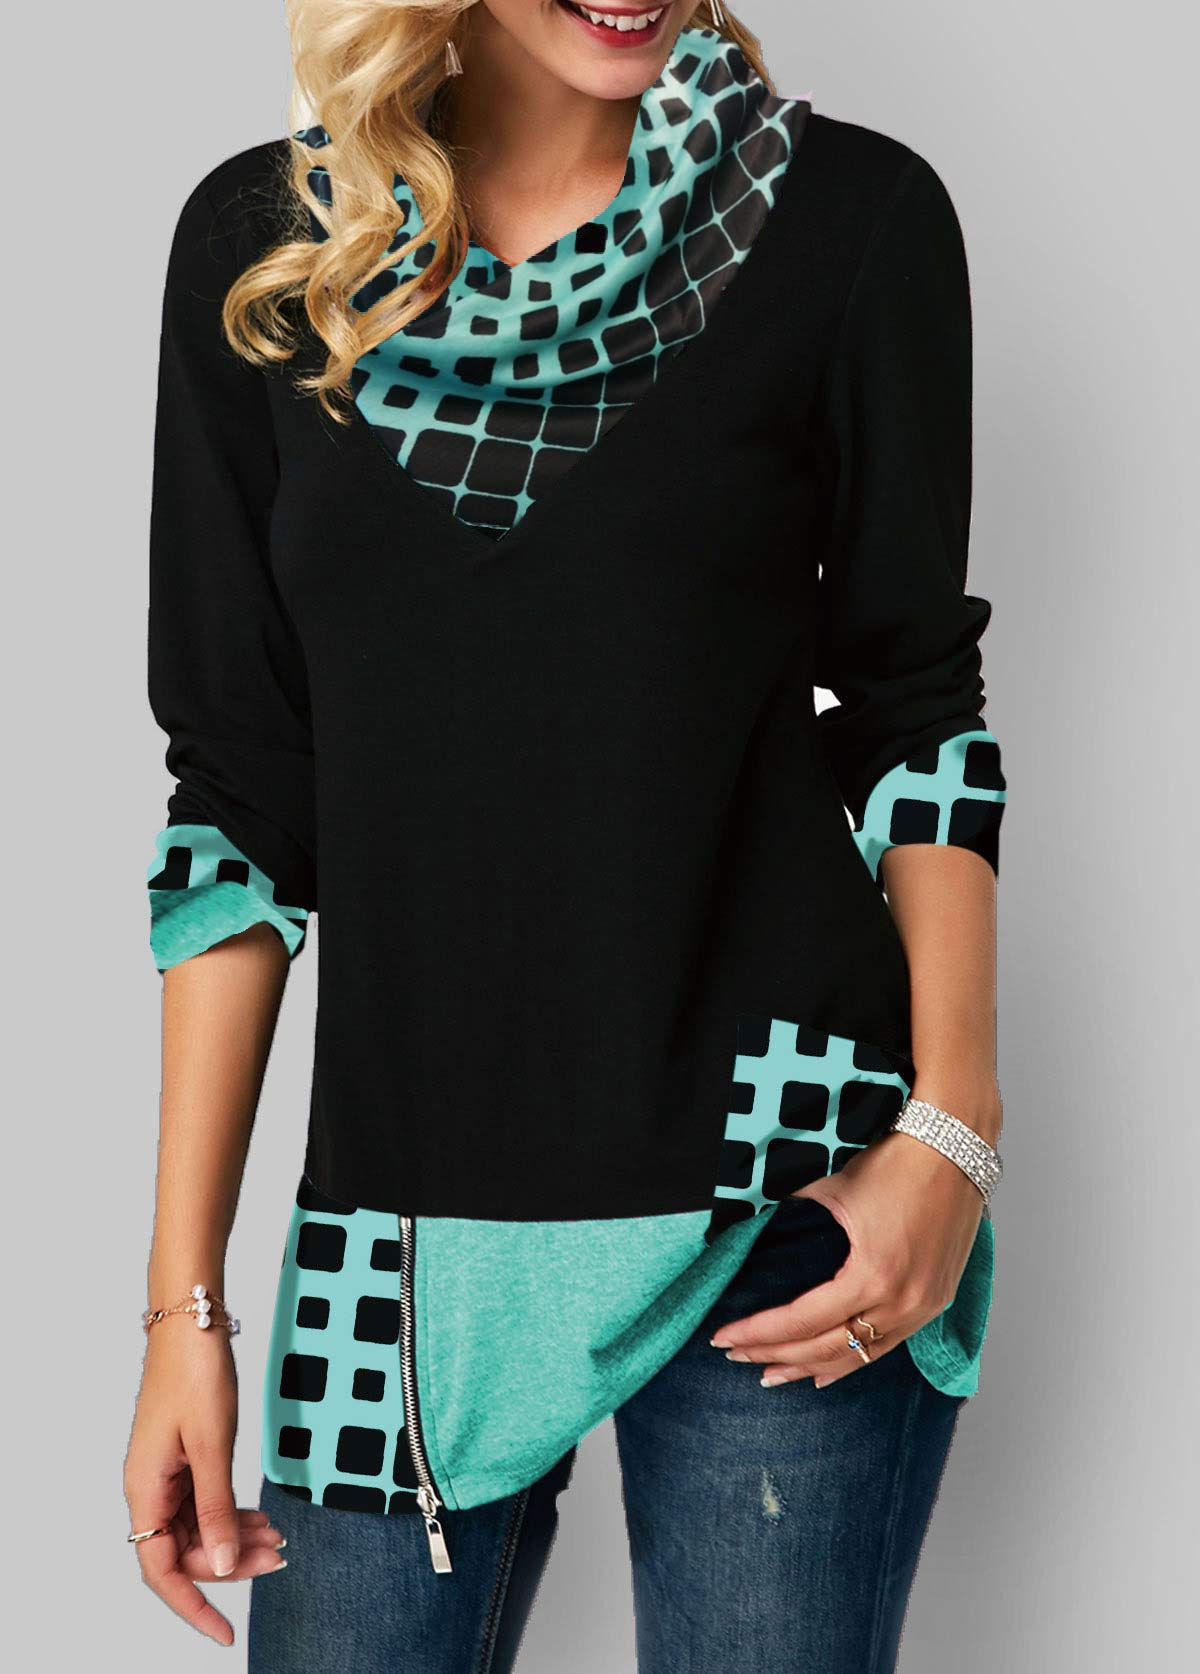 Geometric Print Long Sleeve Zipper Detail T Shirt